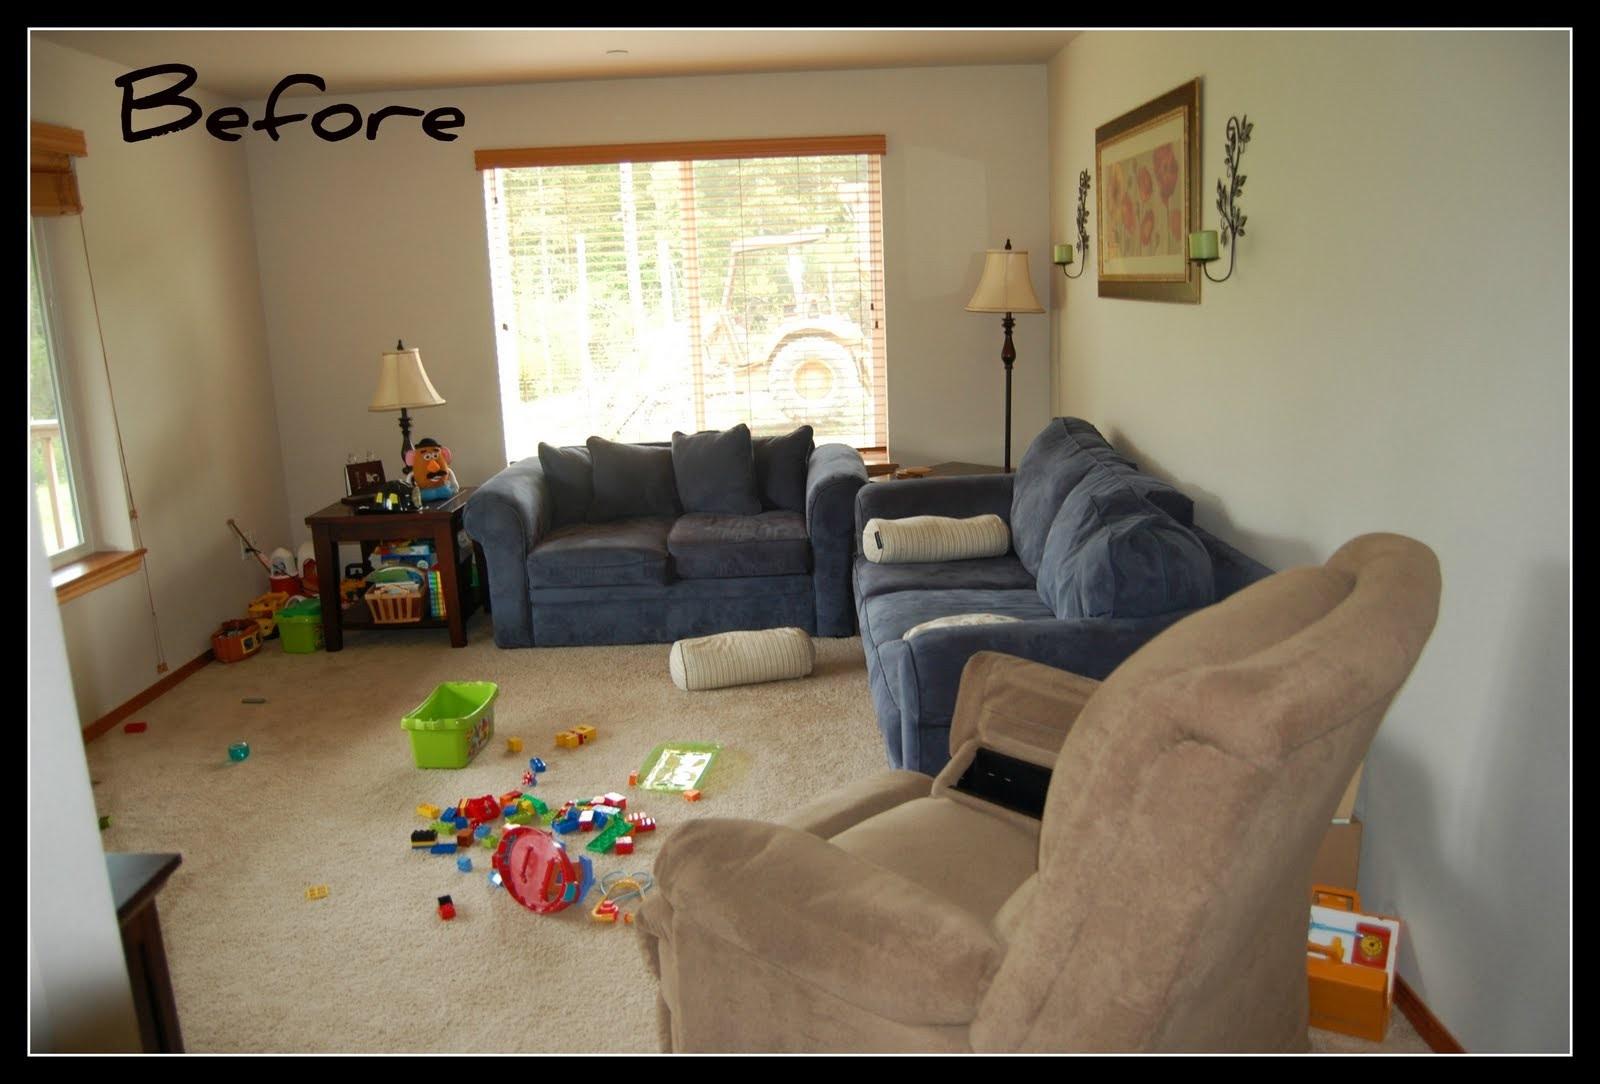 Apartment Small Narrow Living Room Ideas Bedroom Aesthetic